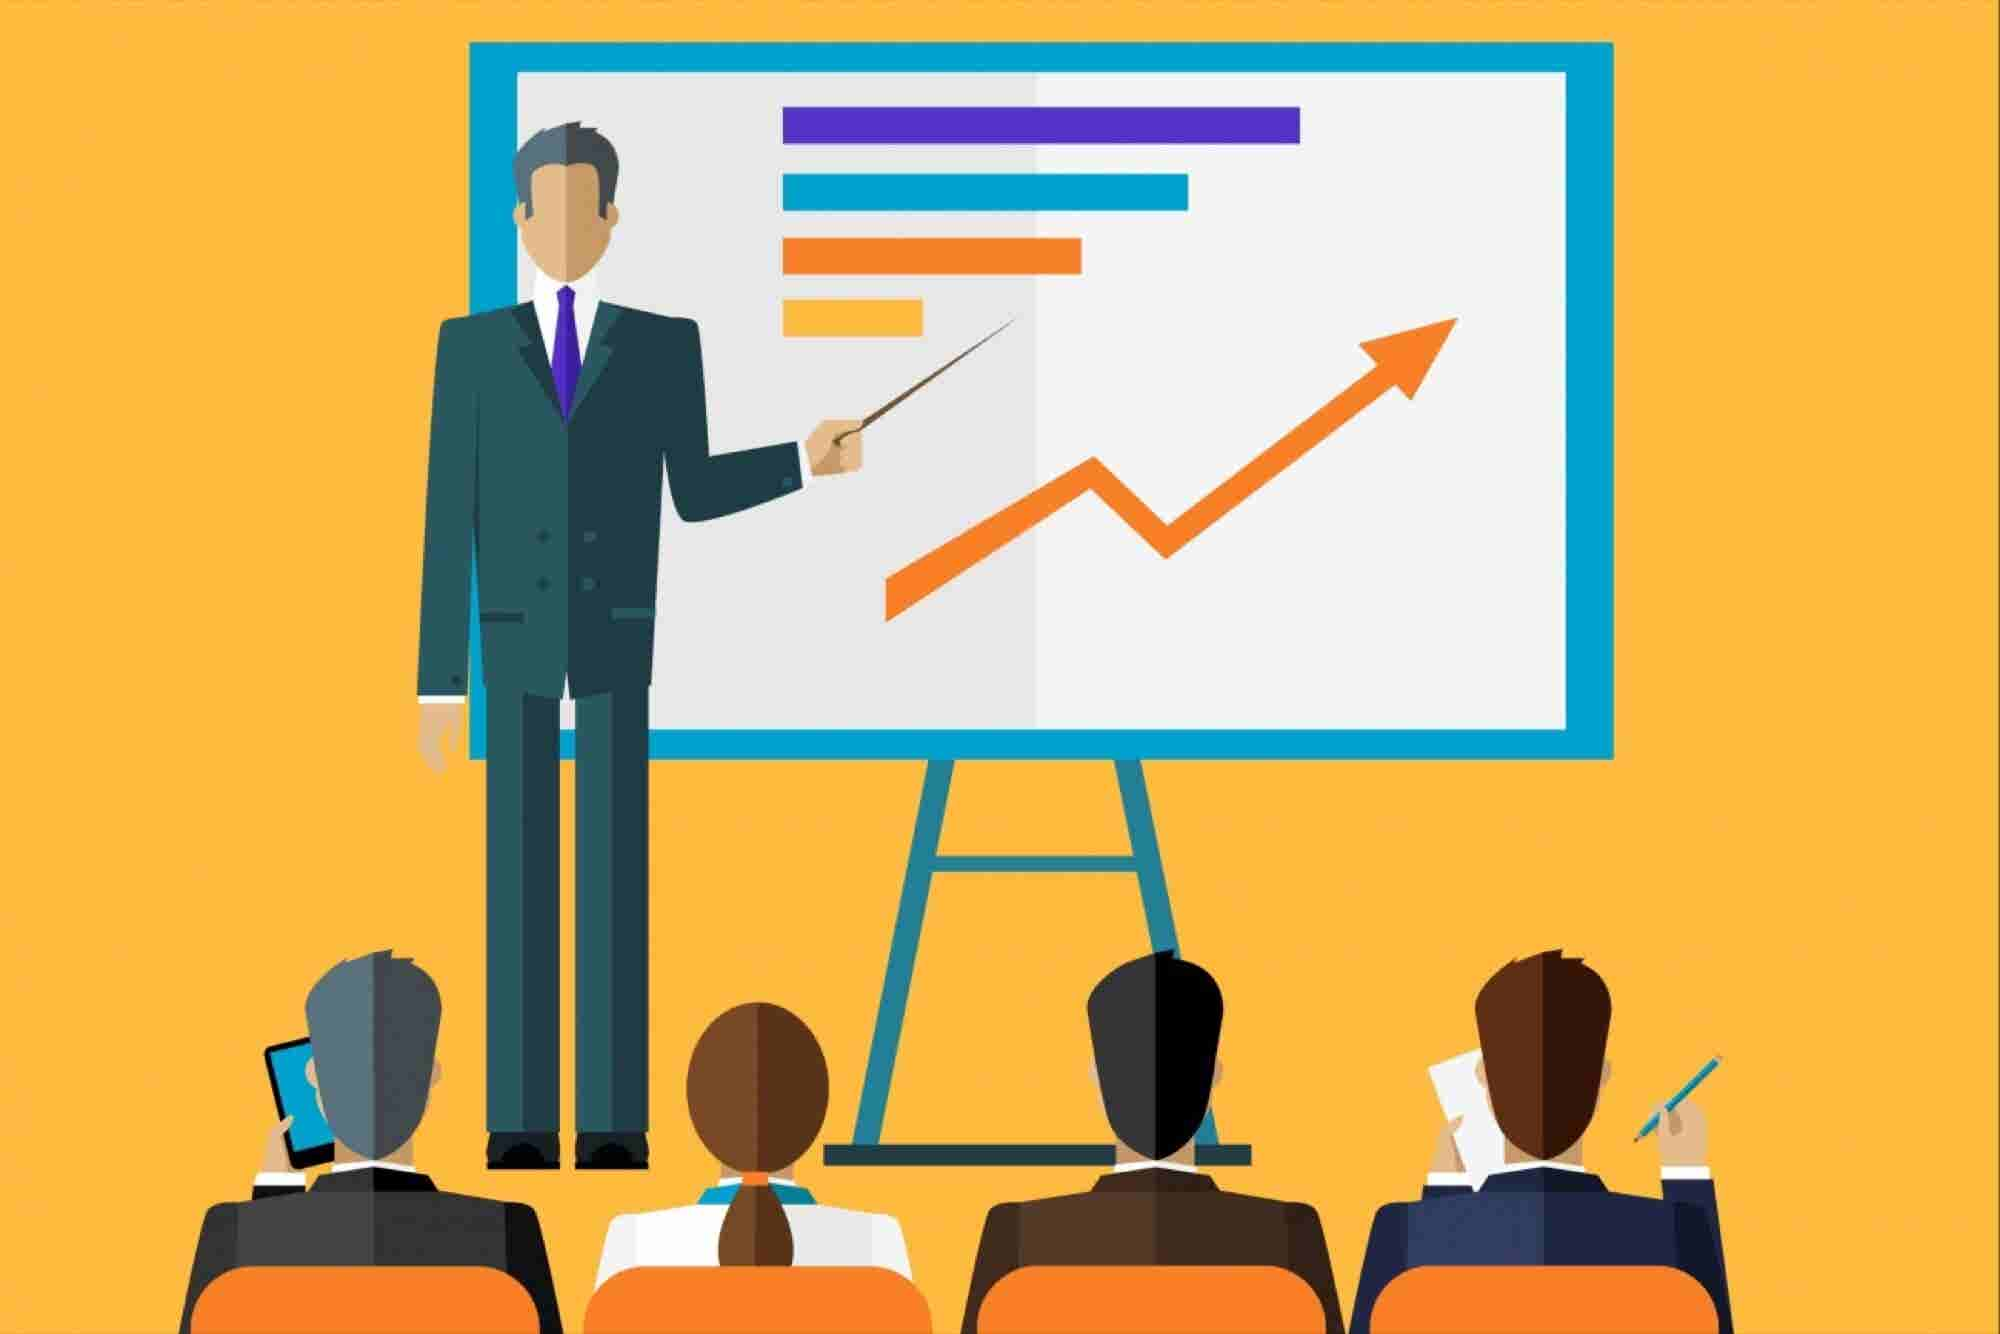 4 Steps to Make Employee Development Stick